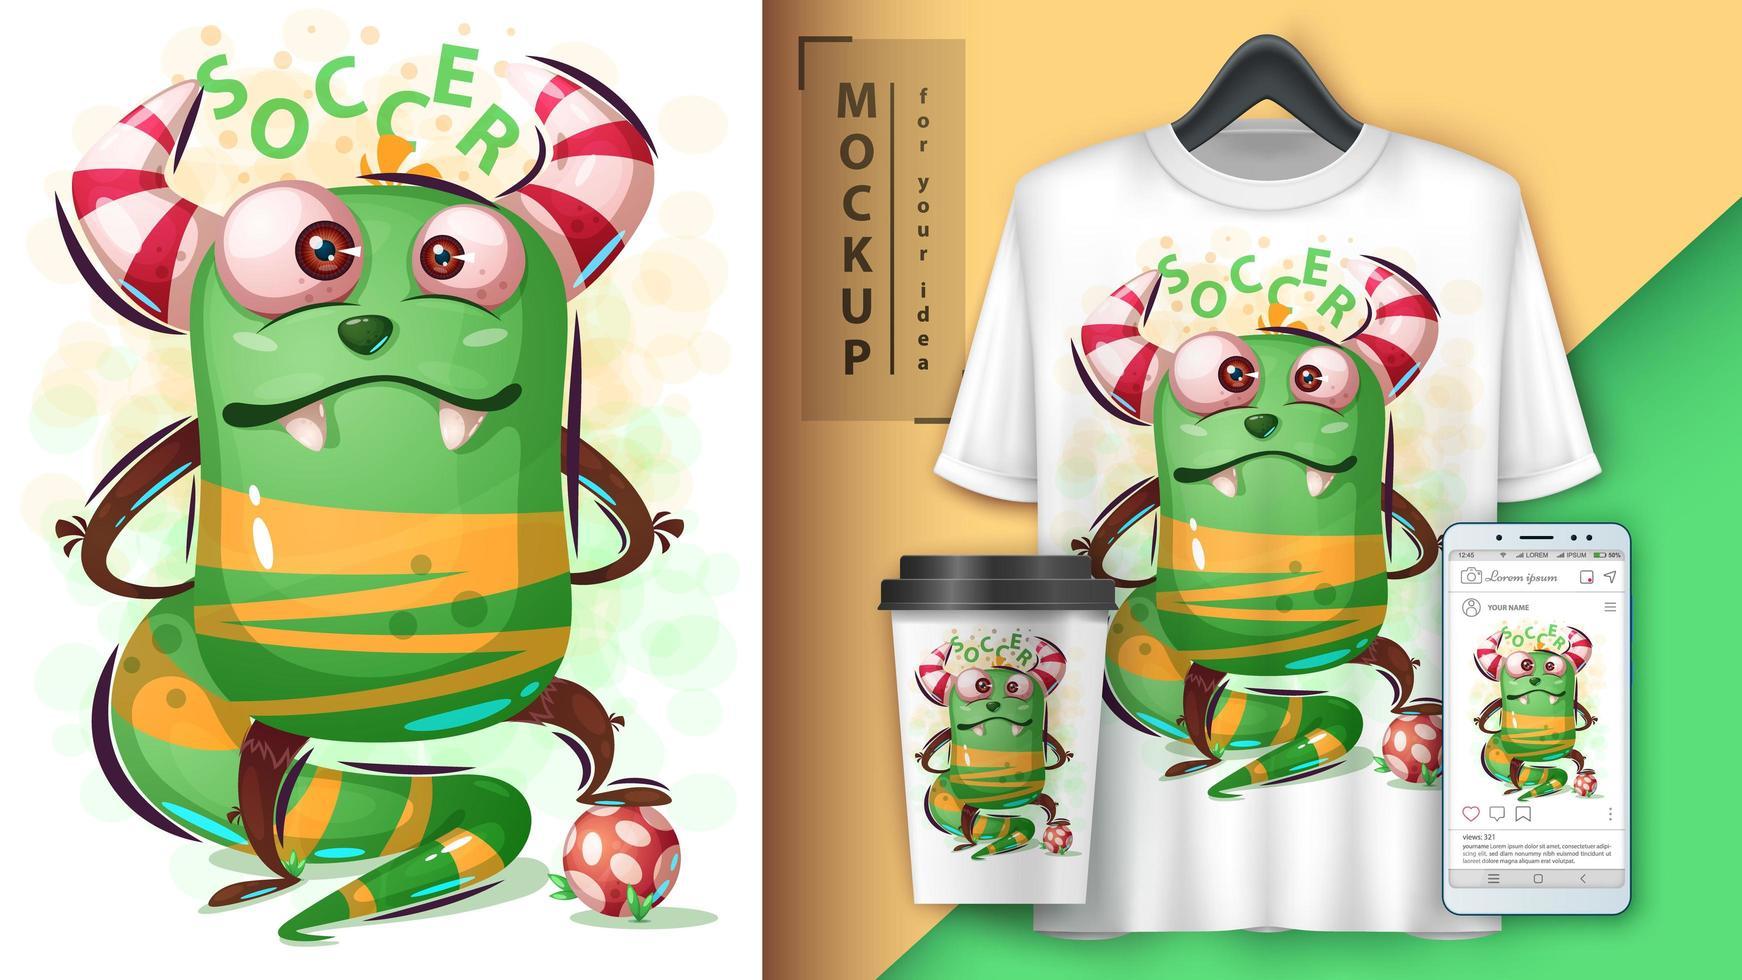 süßes grünes Monster, das Fußball spielt vektor